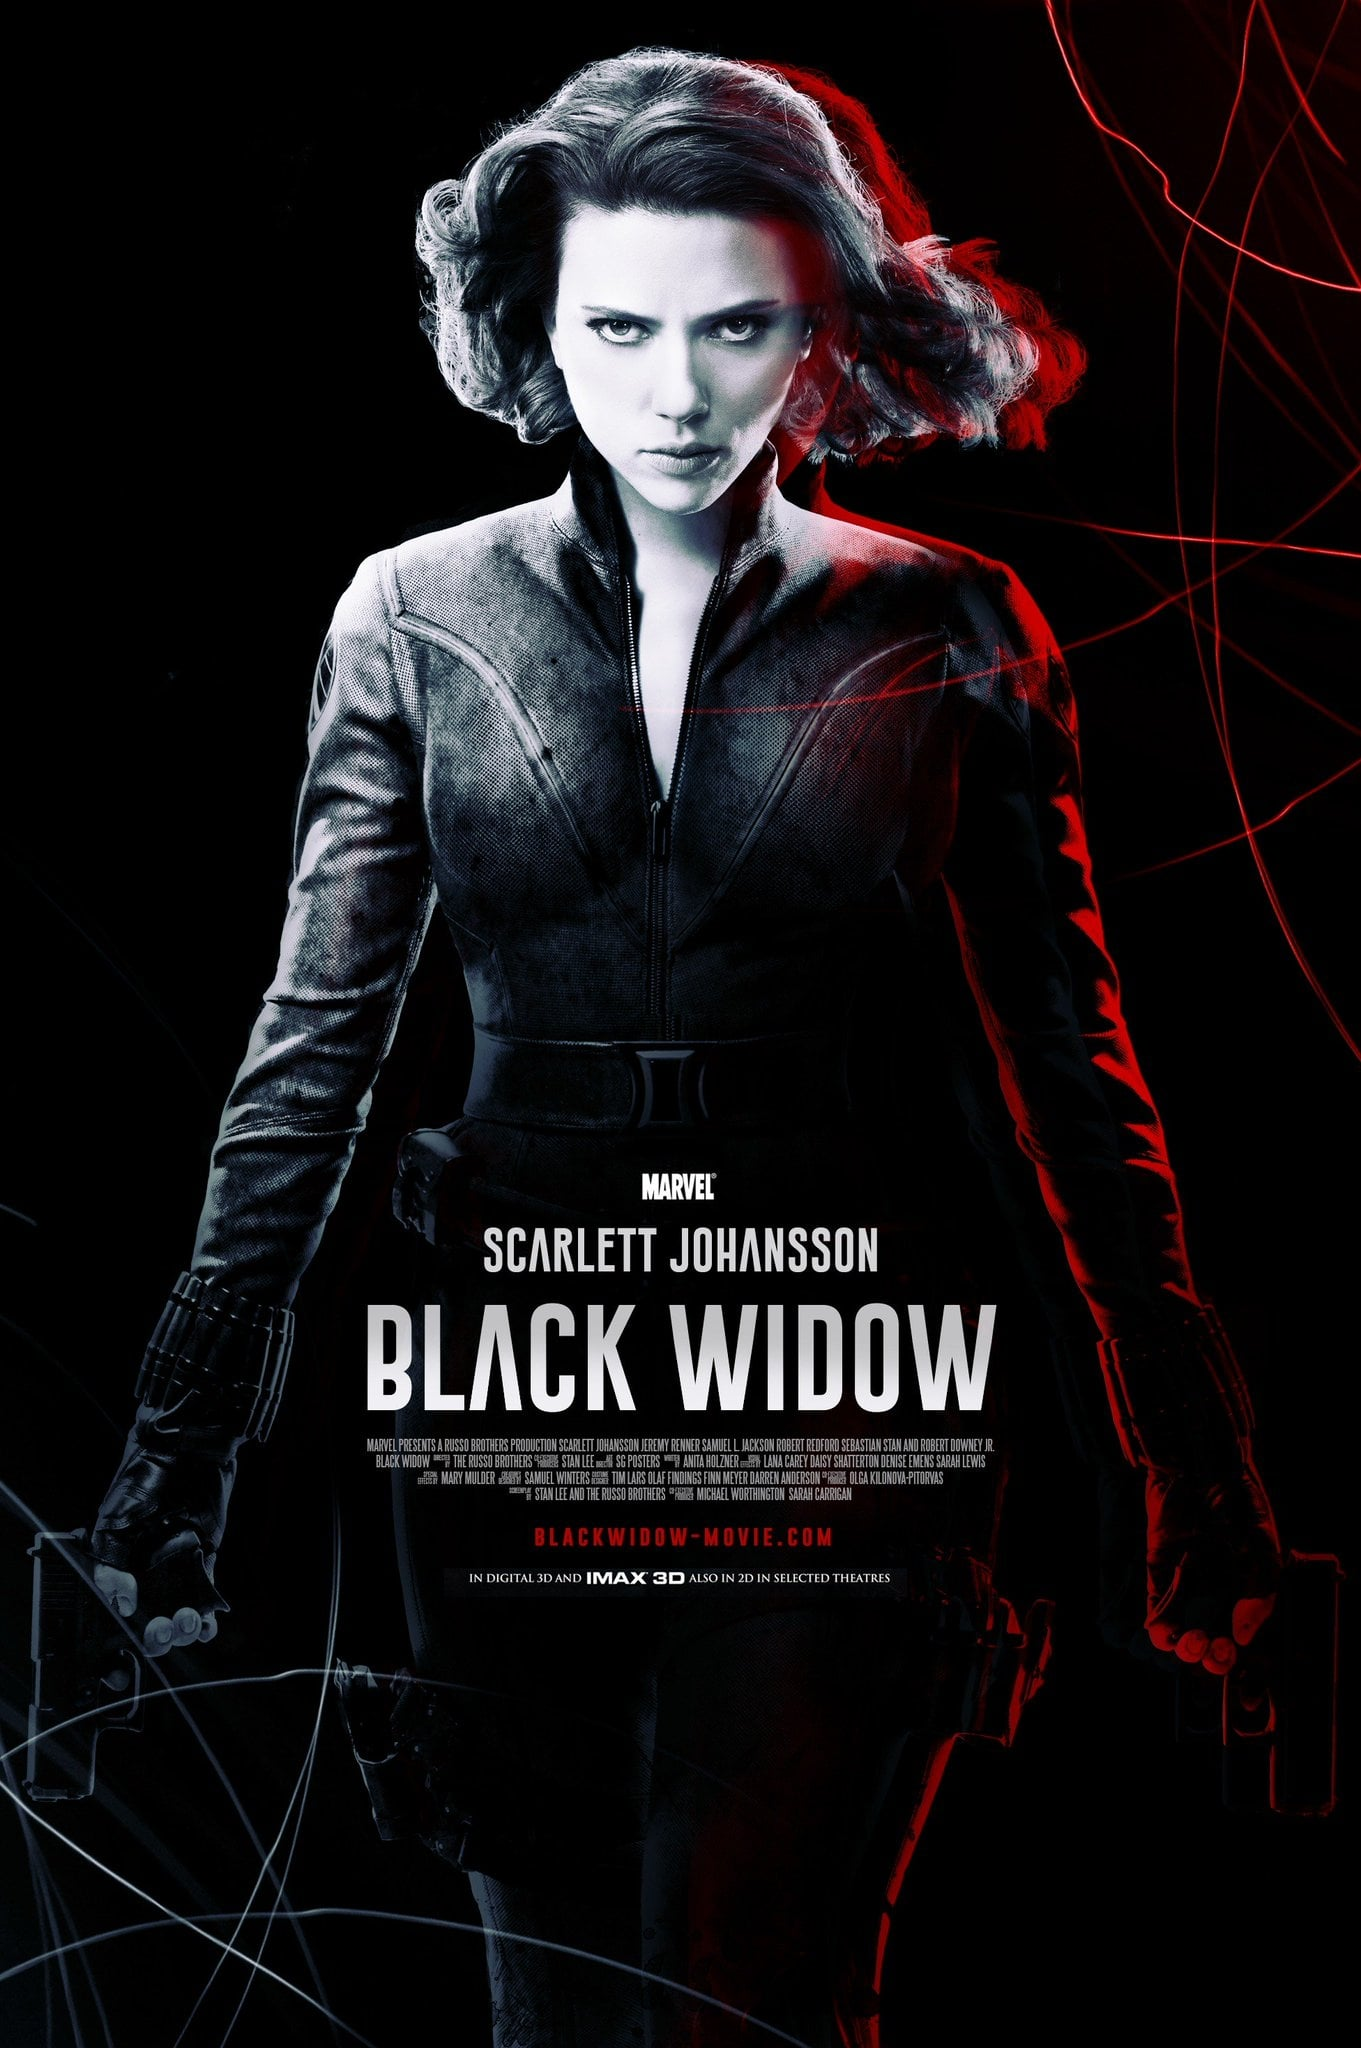 Black Widow (2020) - Posters — The Movie Database (TMDb)